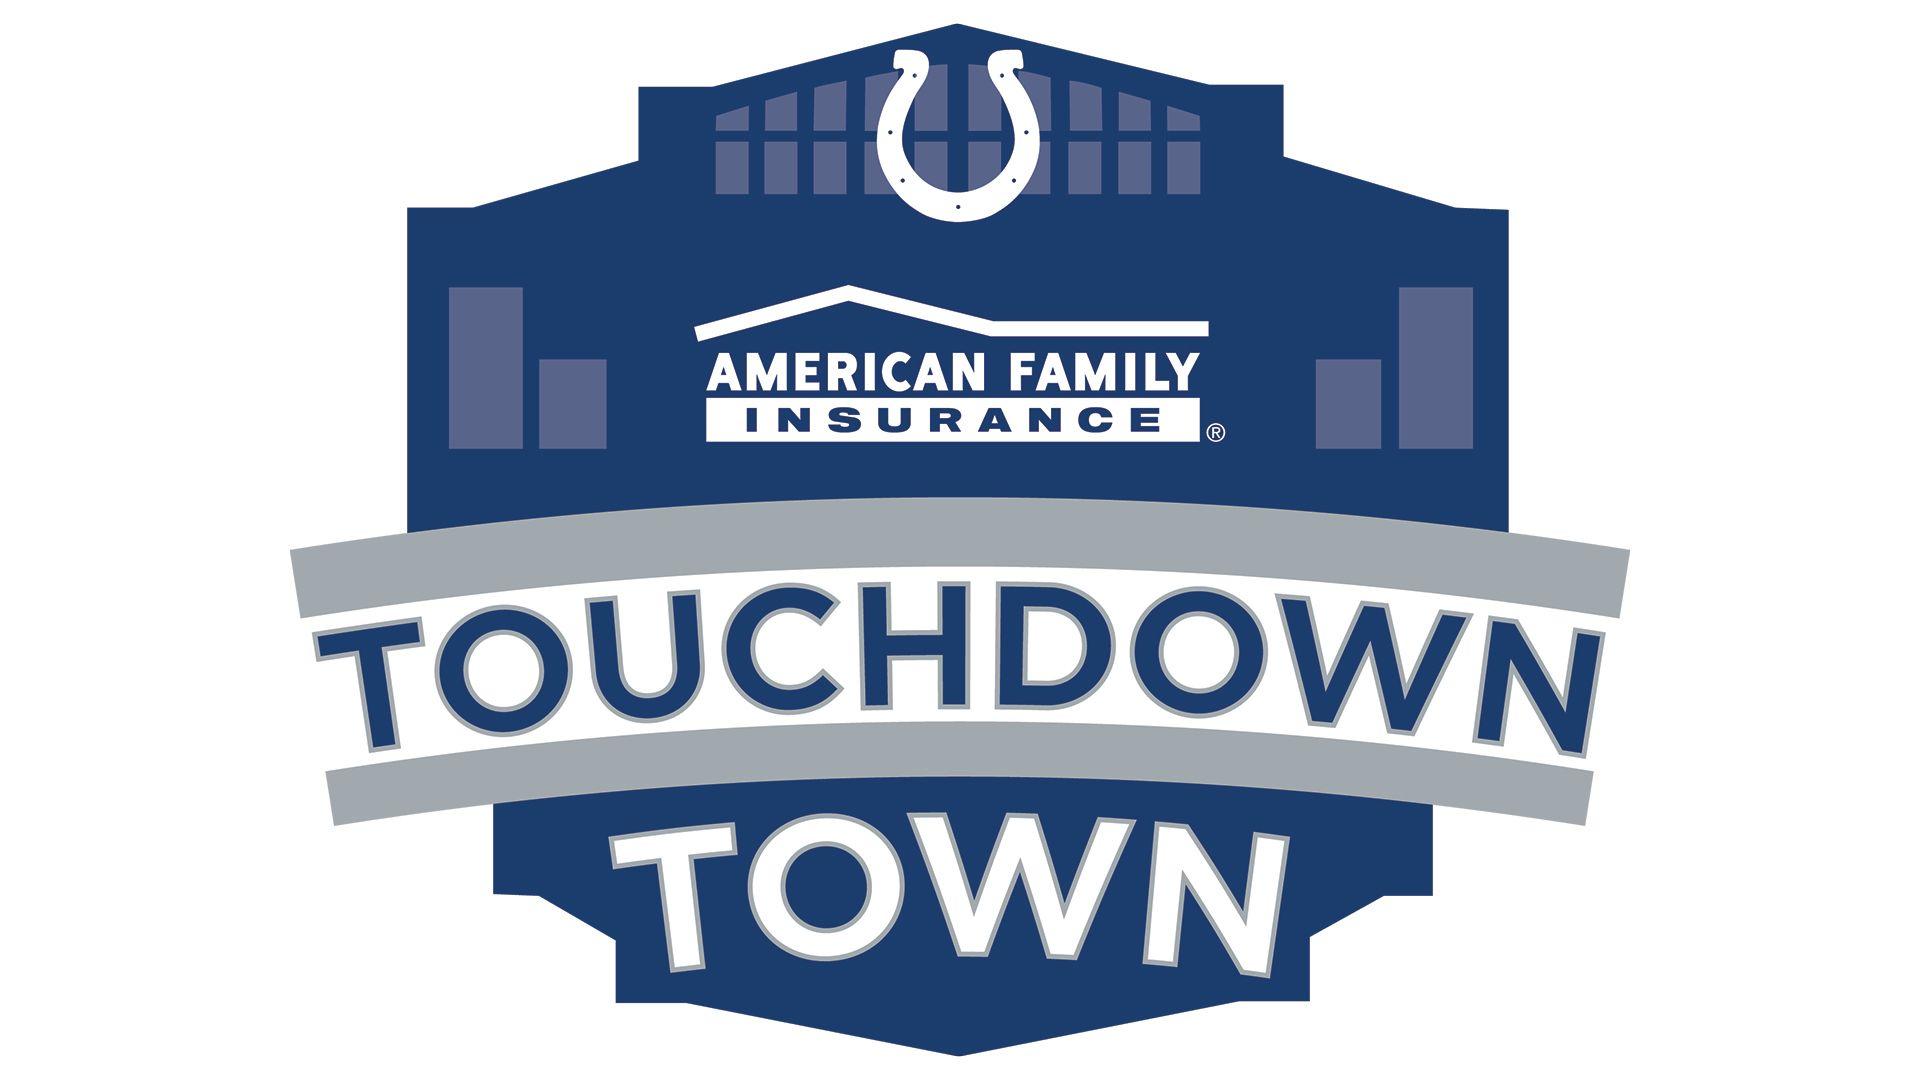 TouchdownTown